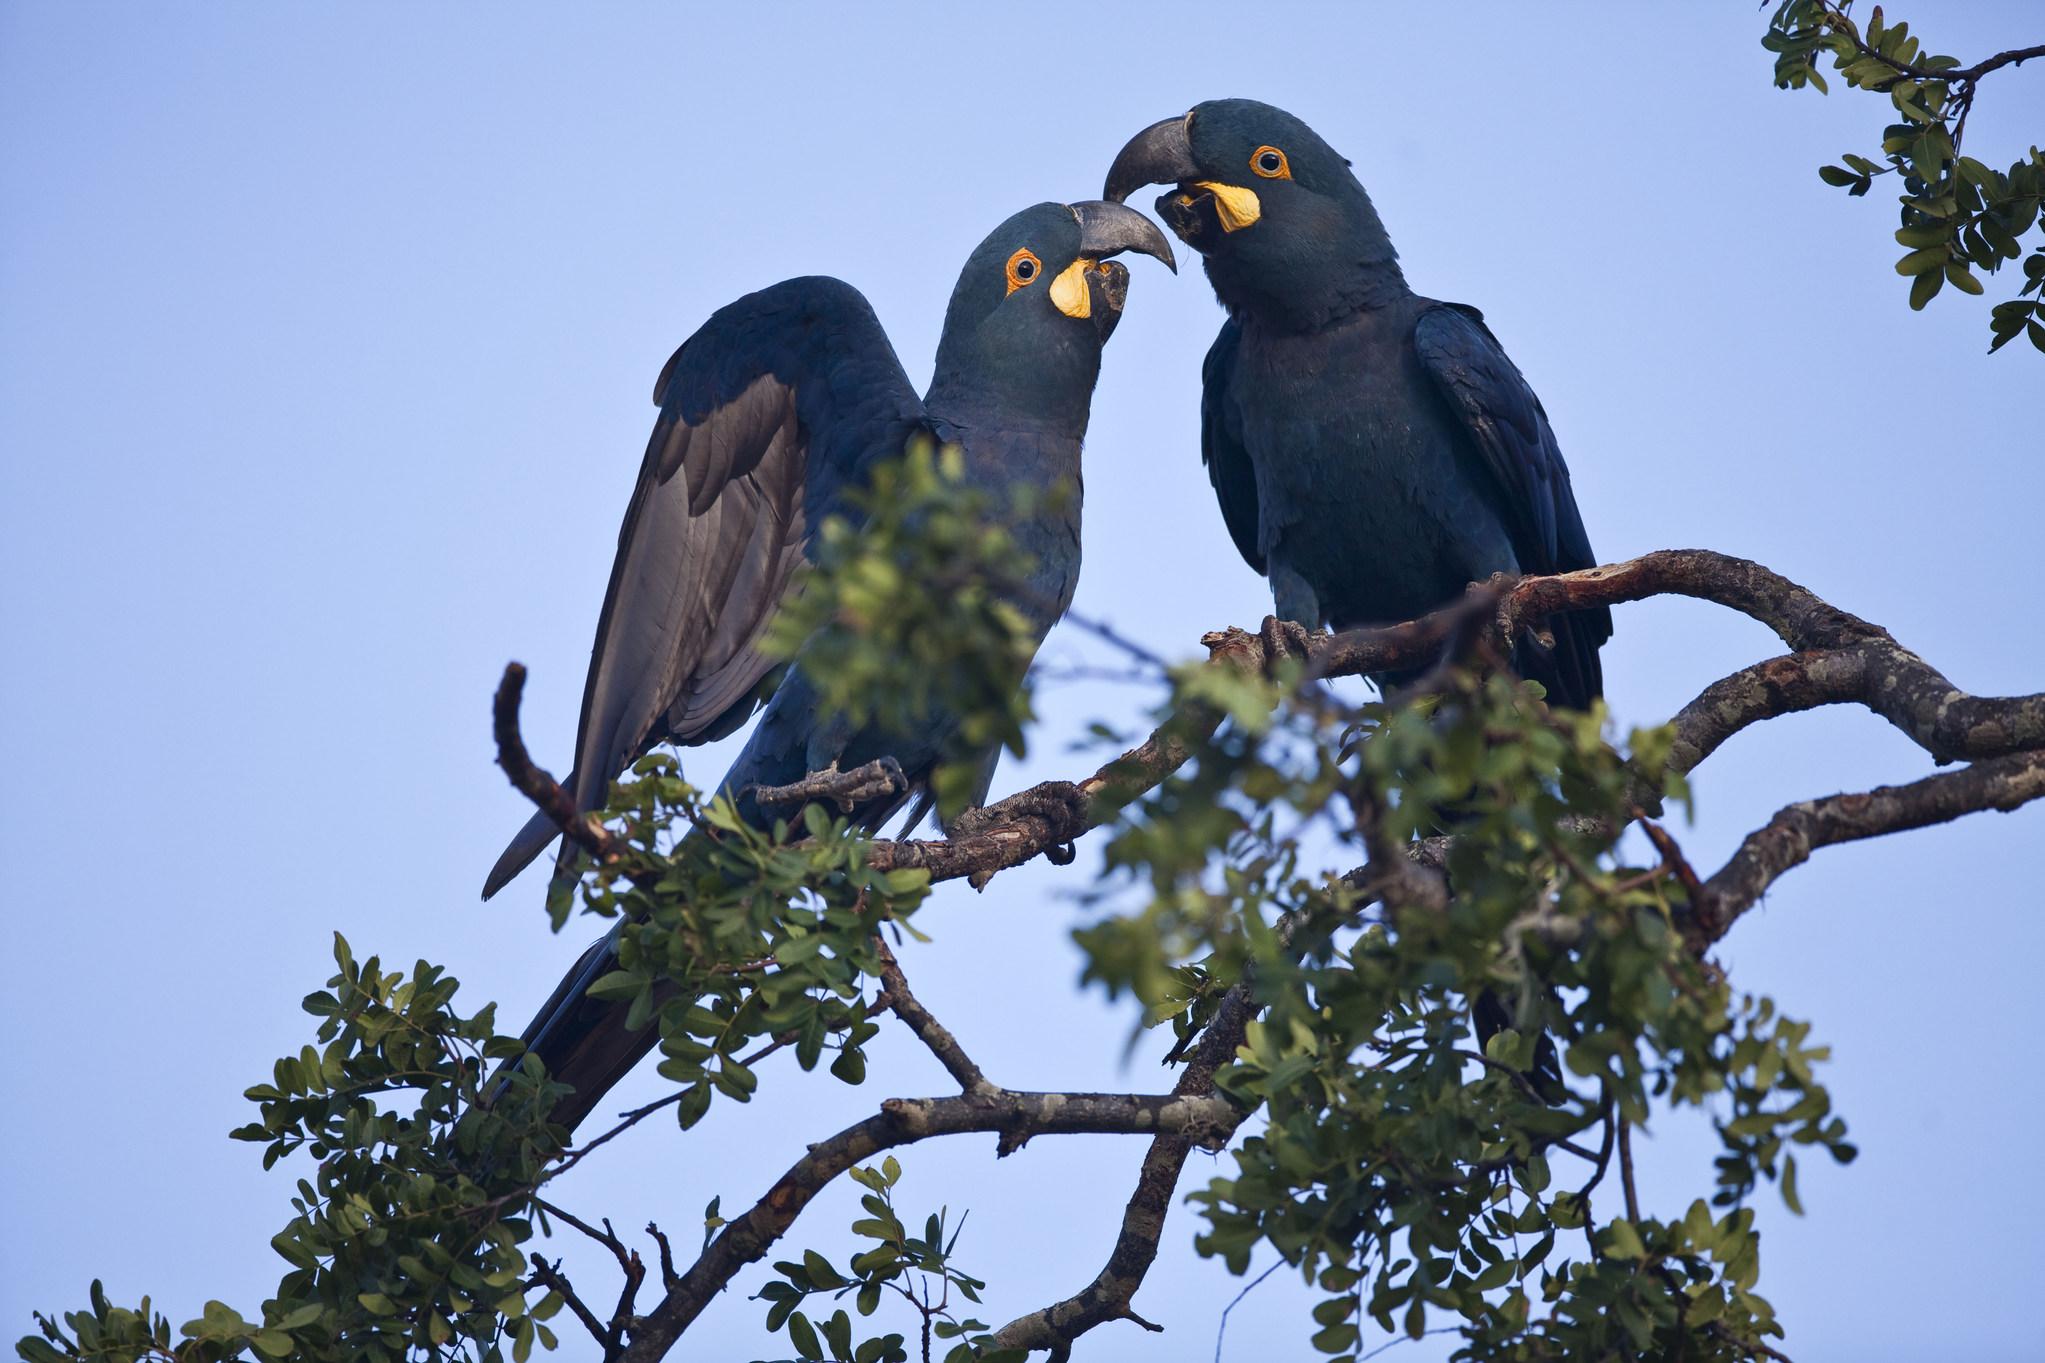 Jeremoabo_BA, Brazil.  Serra Branca farm in Jeremoabo, Bahia, Brazil. In this photo Lear's Macaw (Anodorhynchus leari) in caatinga biome.  Foto: JOAO MARCOS ROSA / NITRO